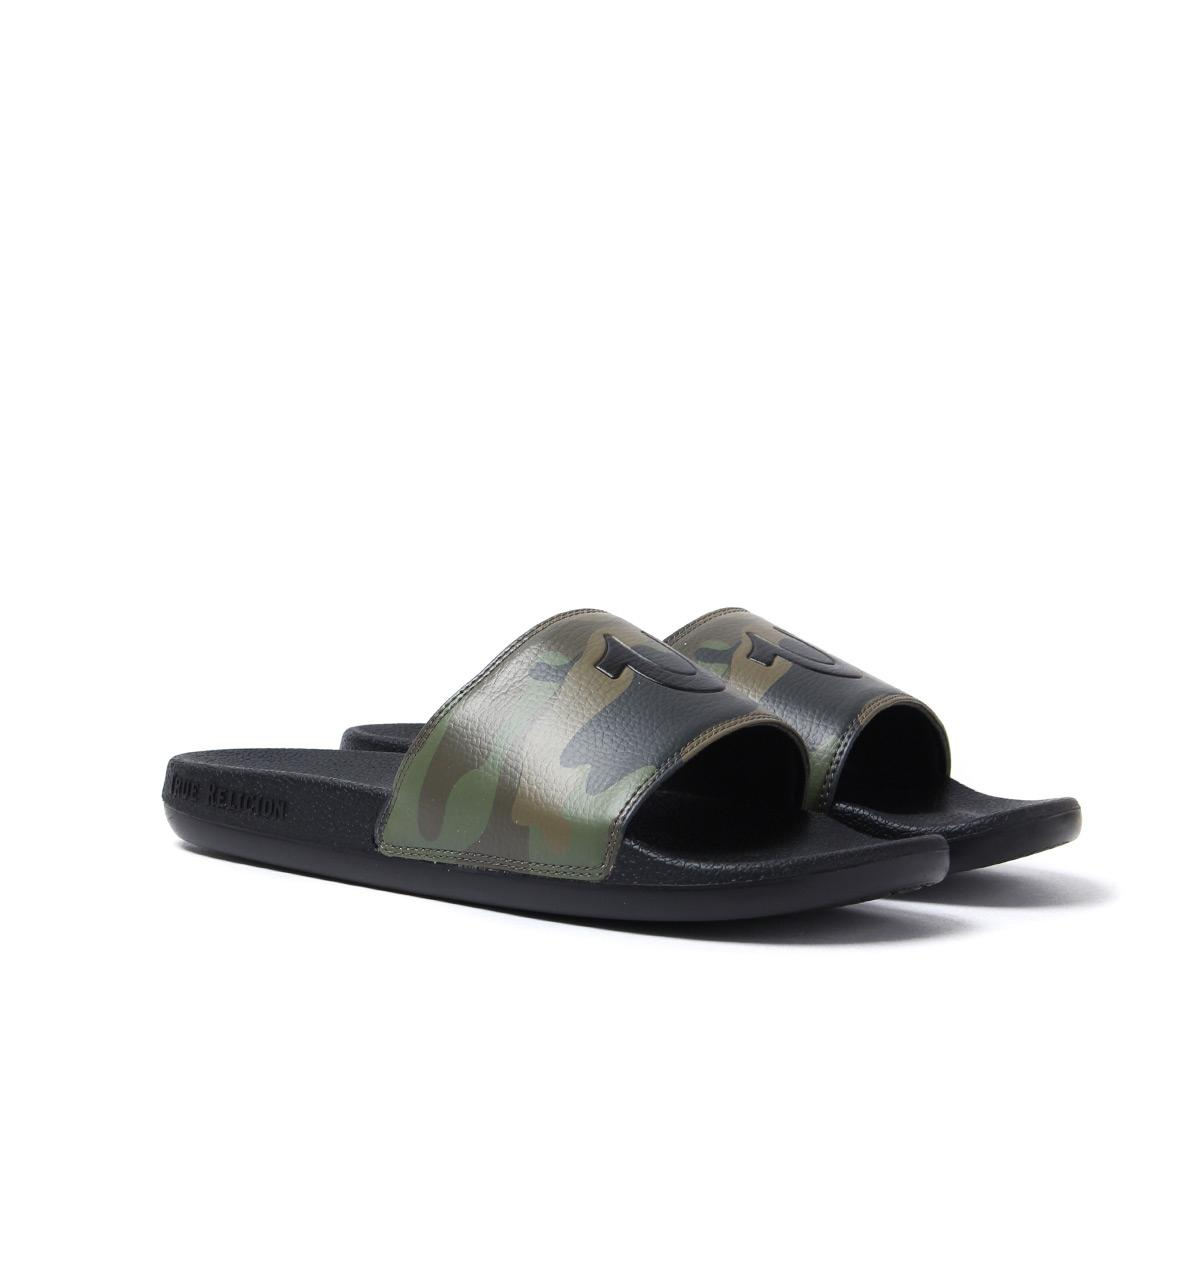 62311b9b91cc True Religion - Camo   Black Pool Slides With Woven Carry Bag for Men - Lyst.  View fullscreen